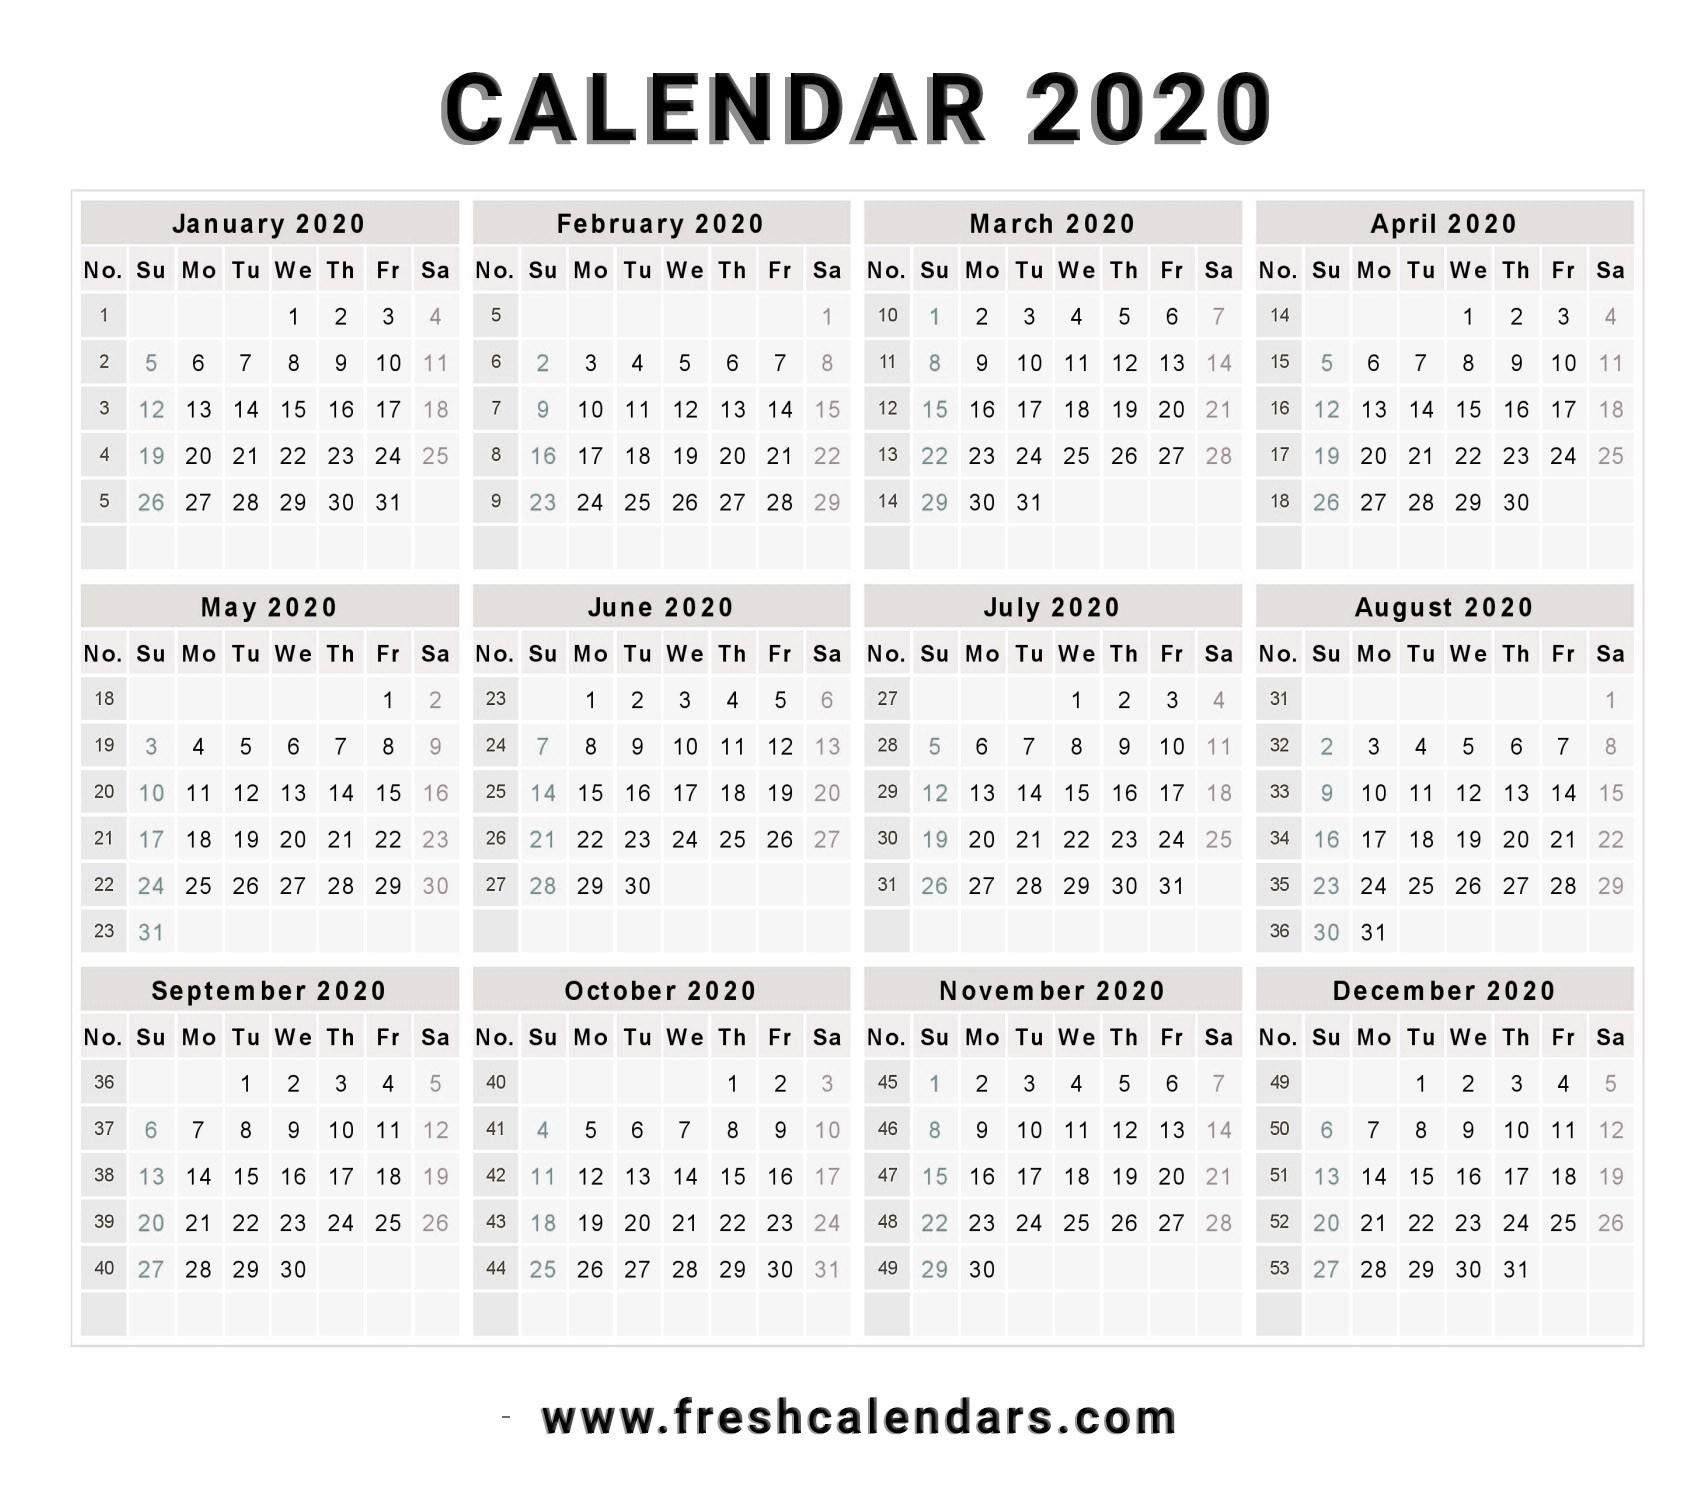 2020 Calendar-Microsoft Calendar Templates 2020